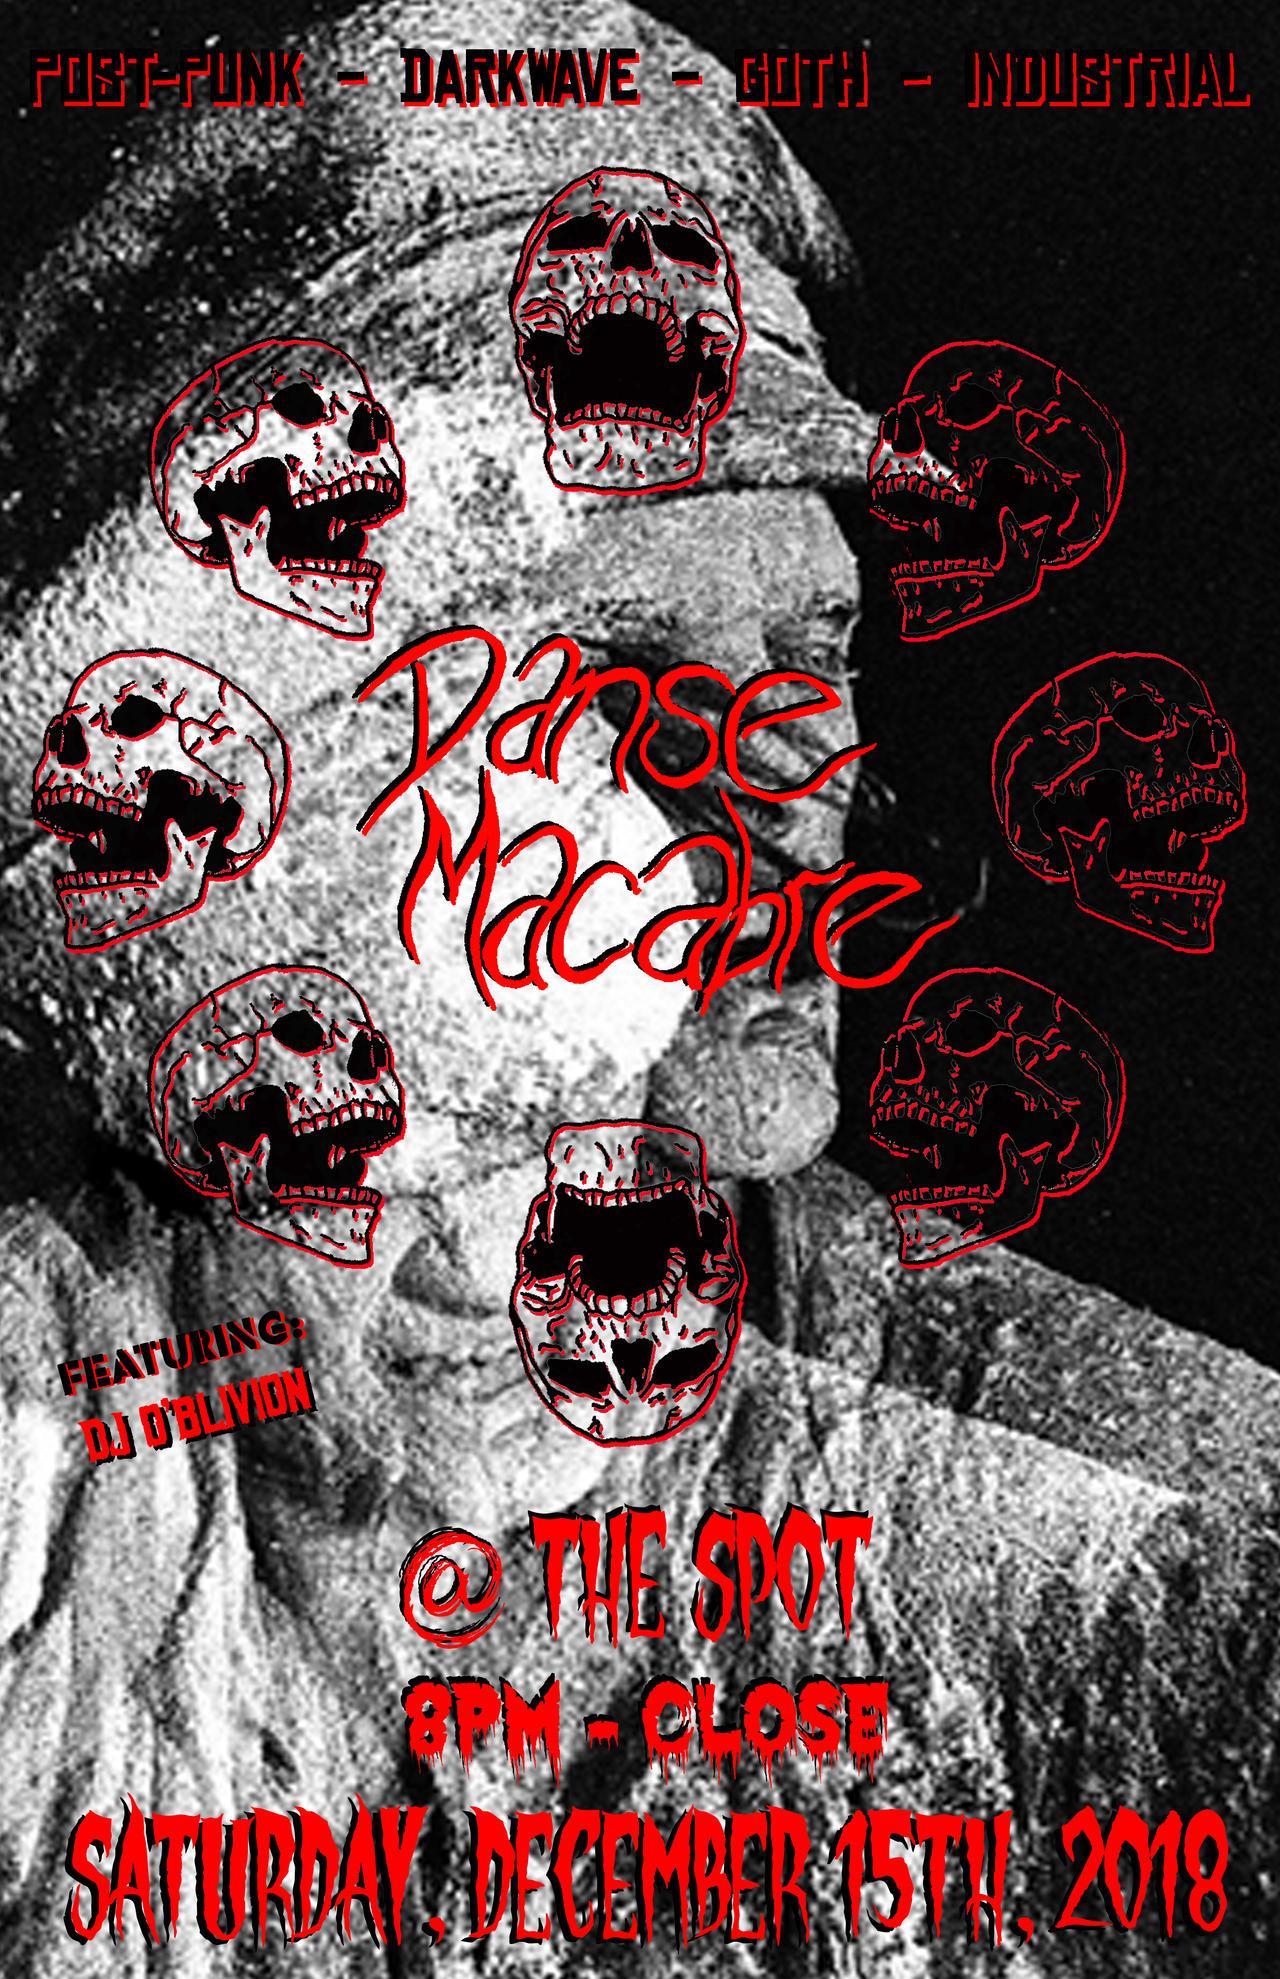 Danse Macabre 12-15-18